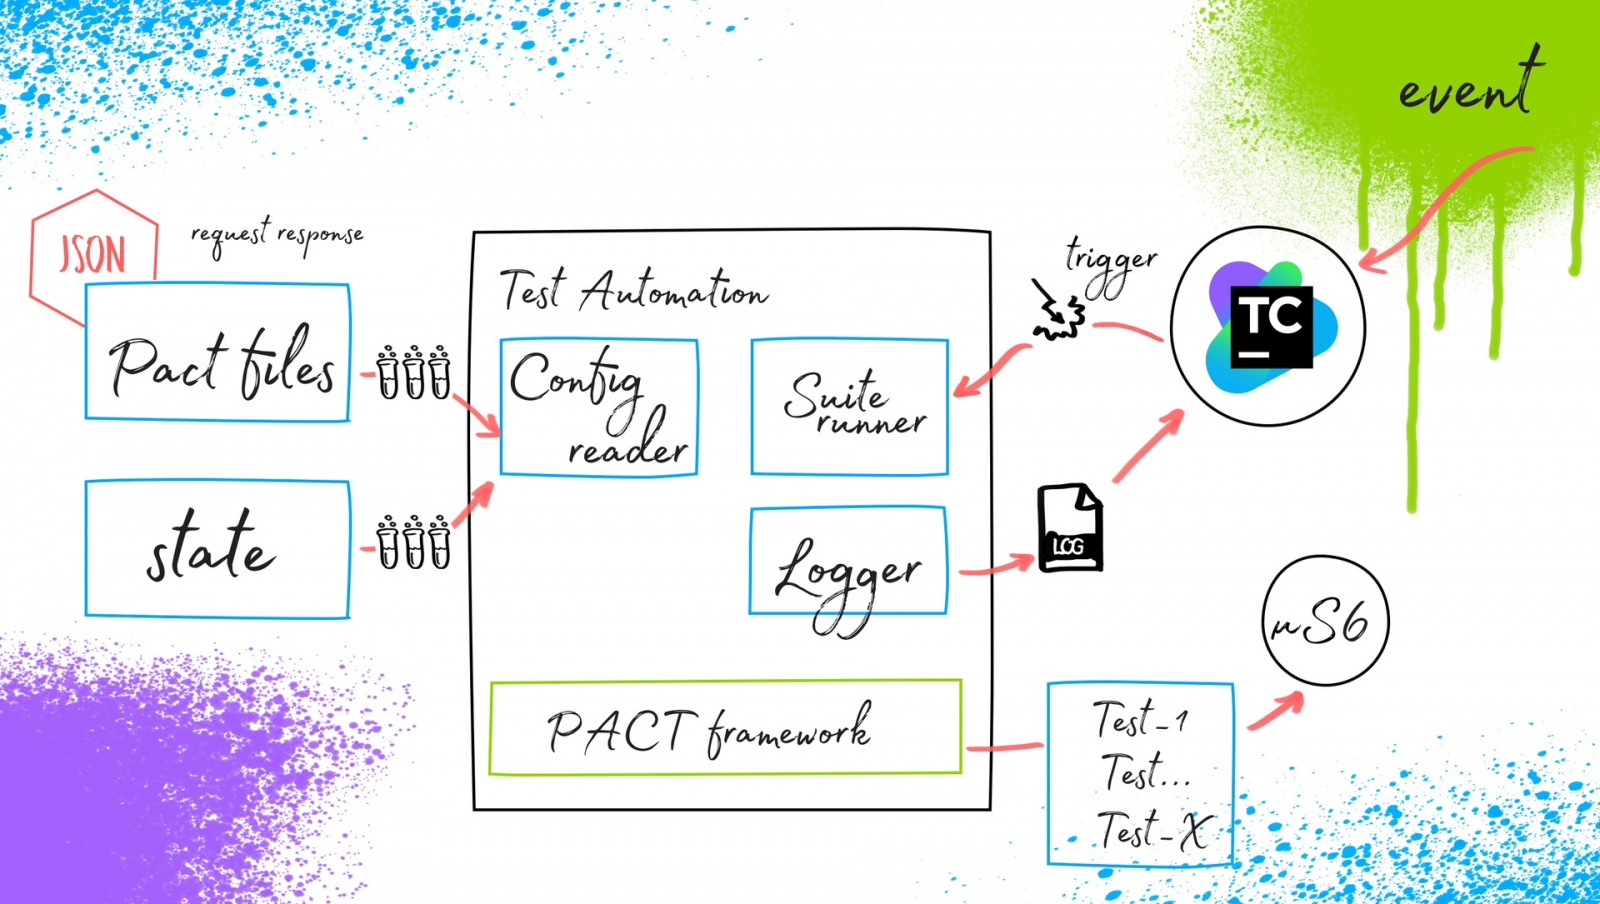 Ядро автоматизации тестирования в микросервисной архитектуре - 6